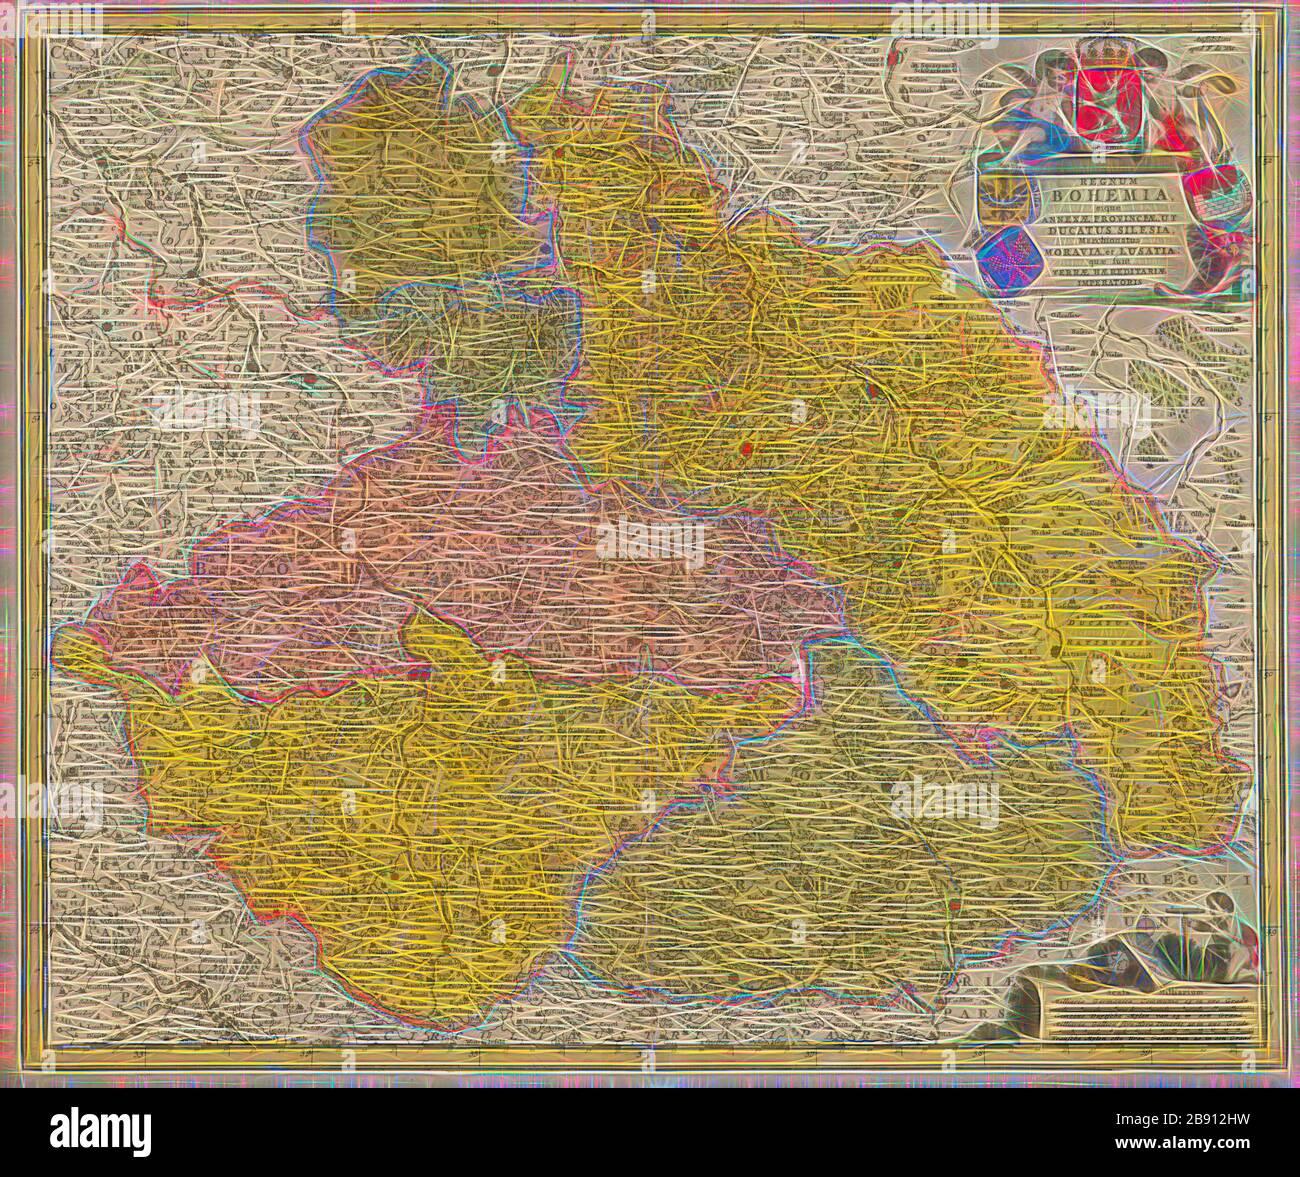 /'Silesie et Maravie/' Silesia Moravia MALLET 1683 map POLAND//CZECH Schlesien